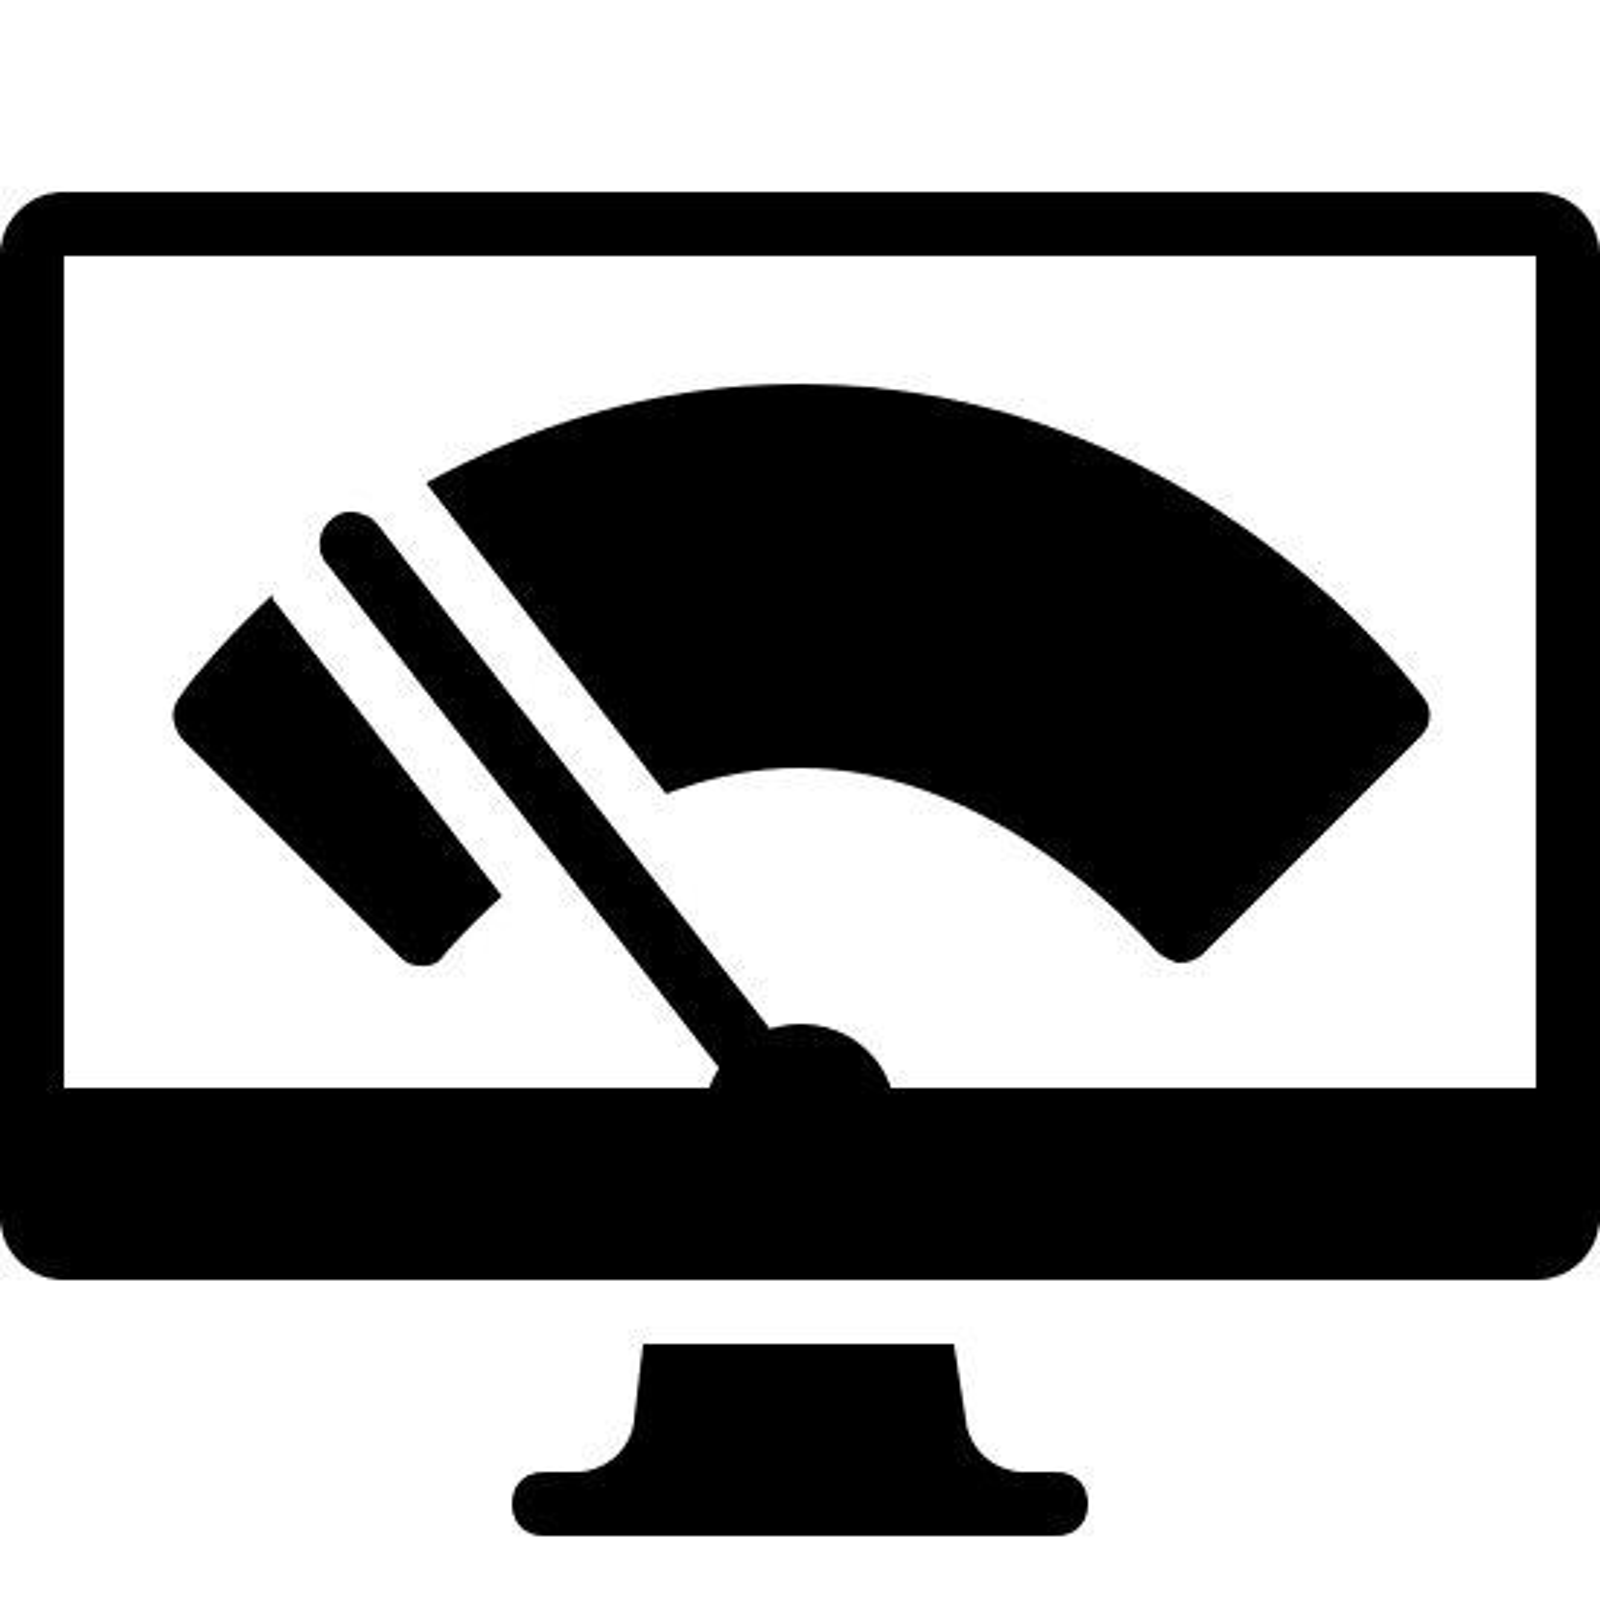 Wiper Filled icon